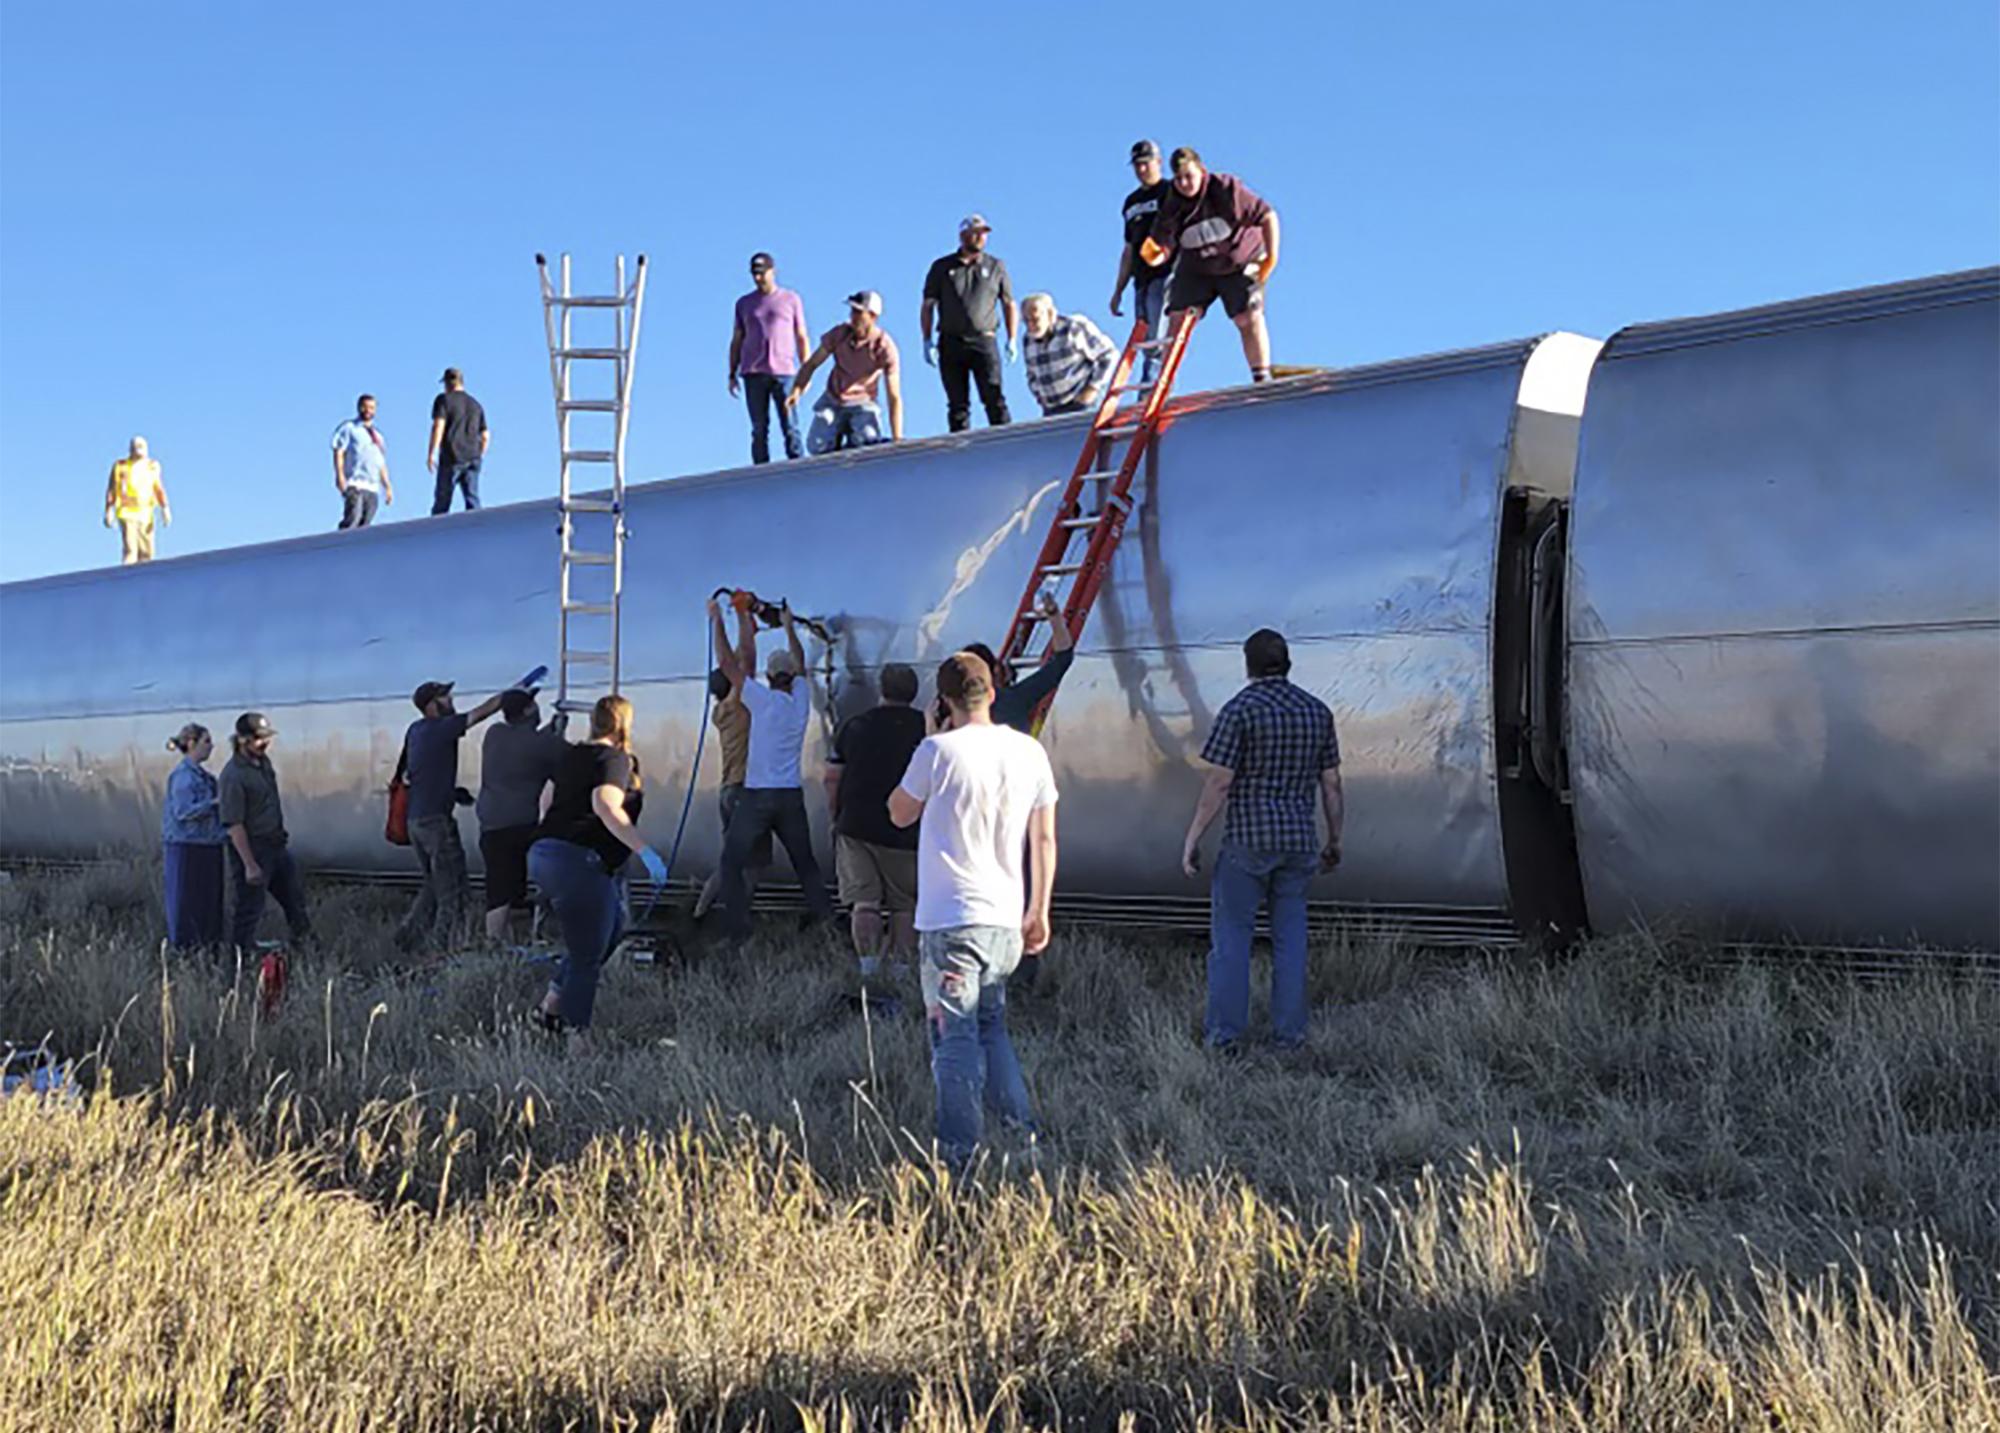 At least 3 dead in Montana Amtrak derailment